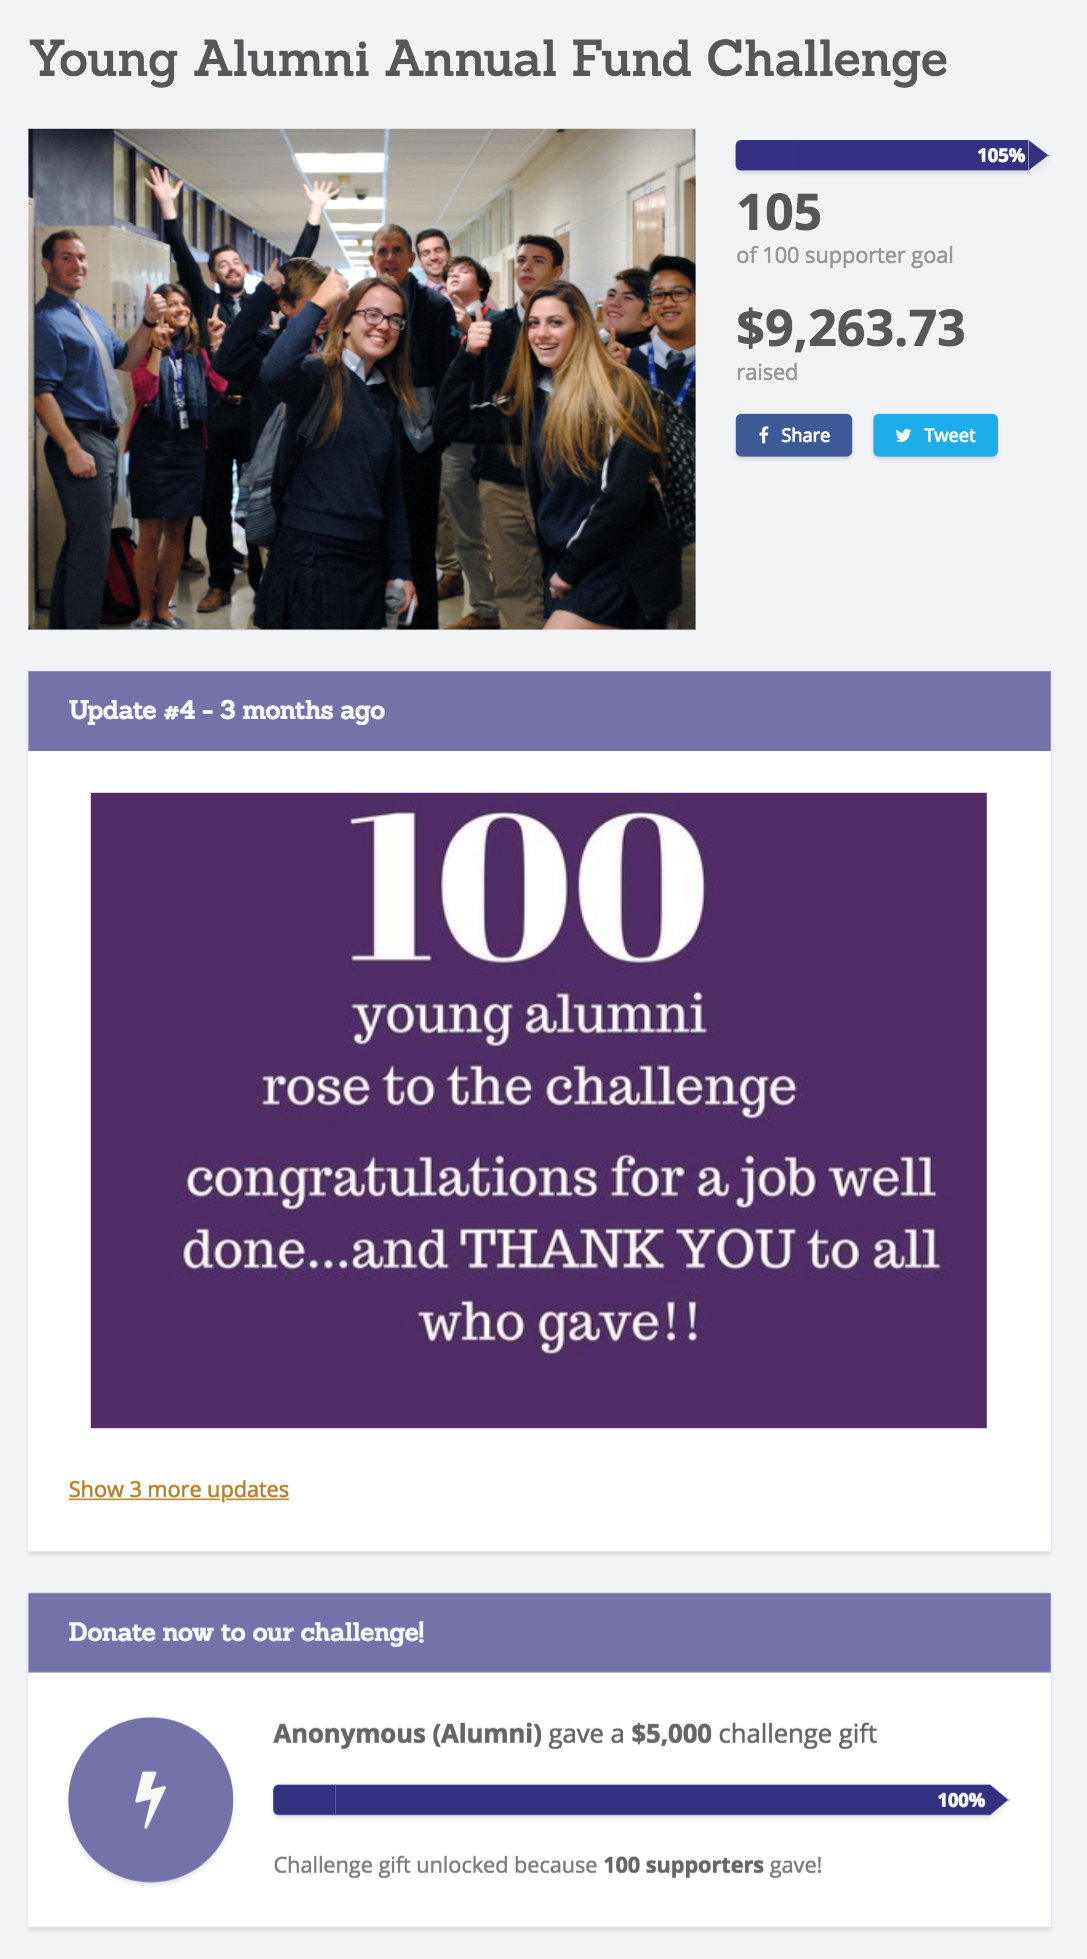 Image: St. Rose's Young Alumni Challenge